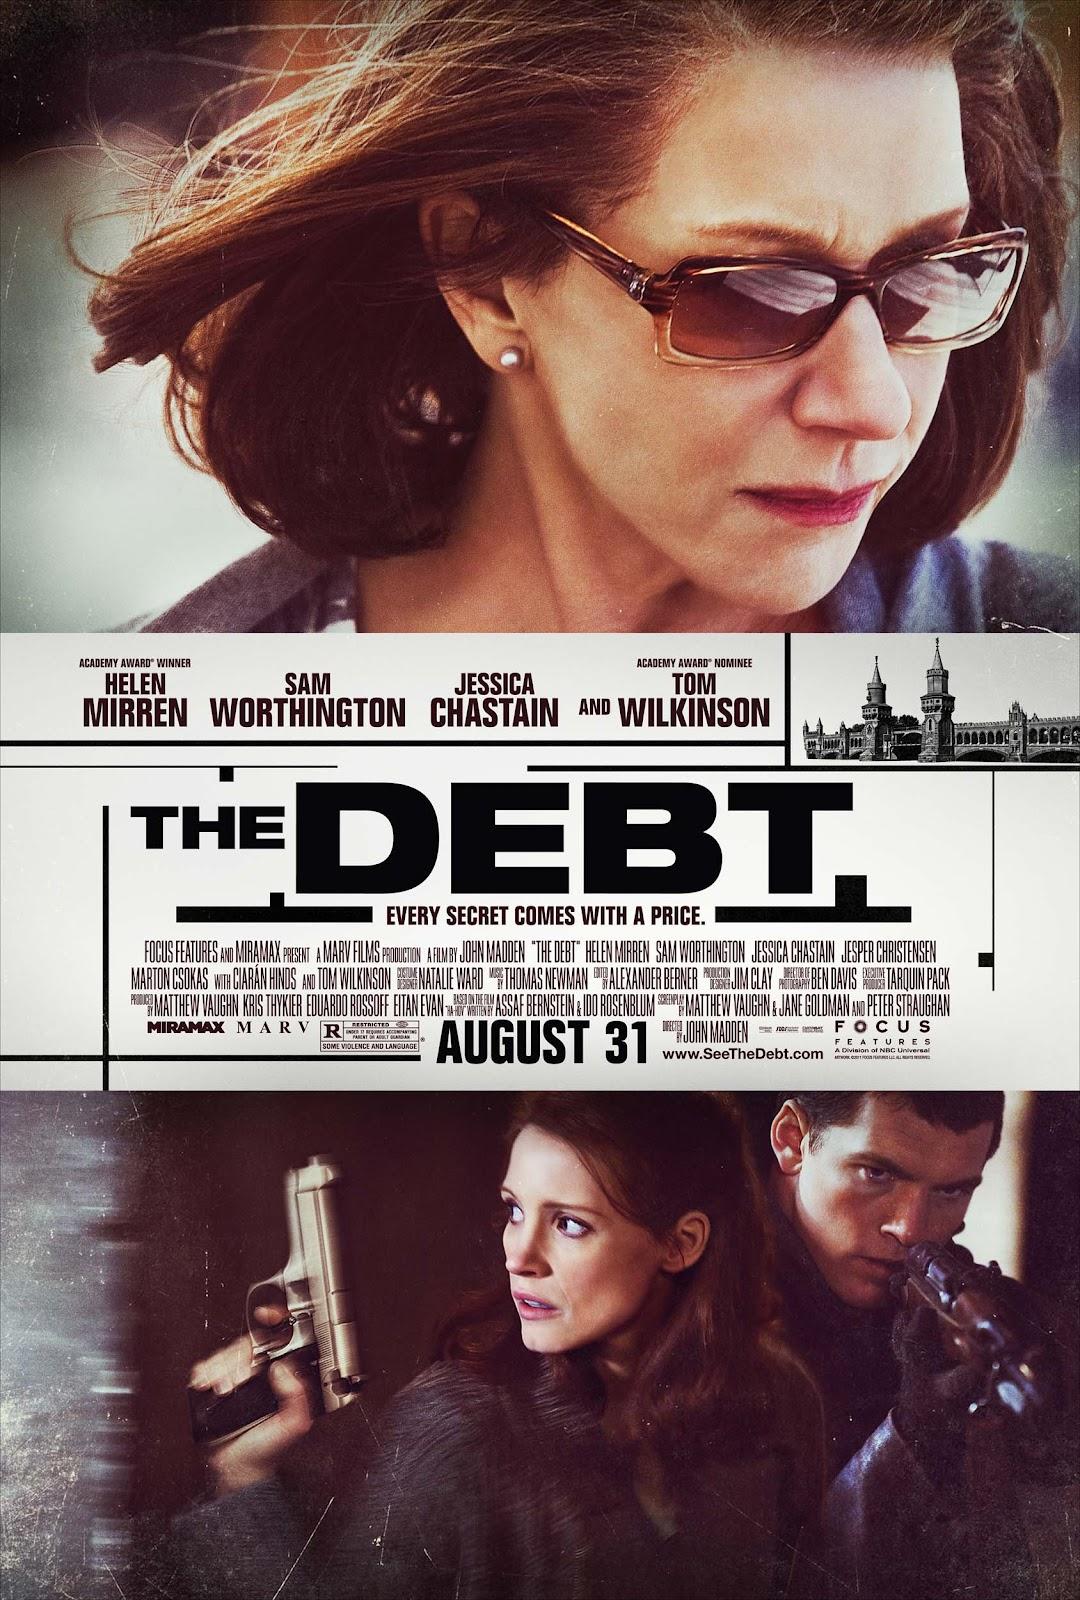 http://4.bp.blogspot.com/-Z7Su9wtGrDY/T-i-1yElXWI/AAAAAAAAKzg/VsrCophL1xc/s1600/The+Debt.jpg